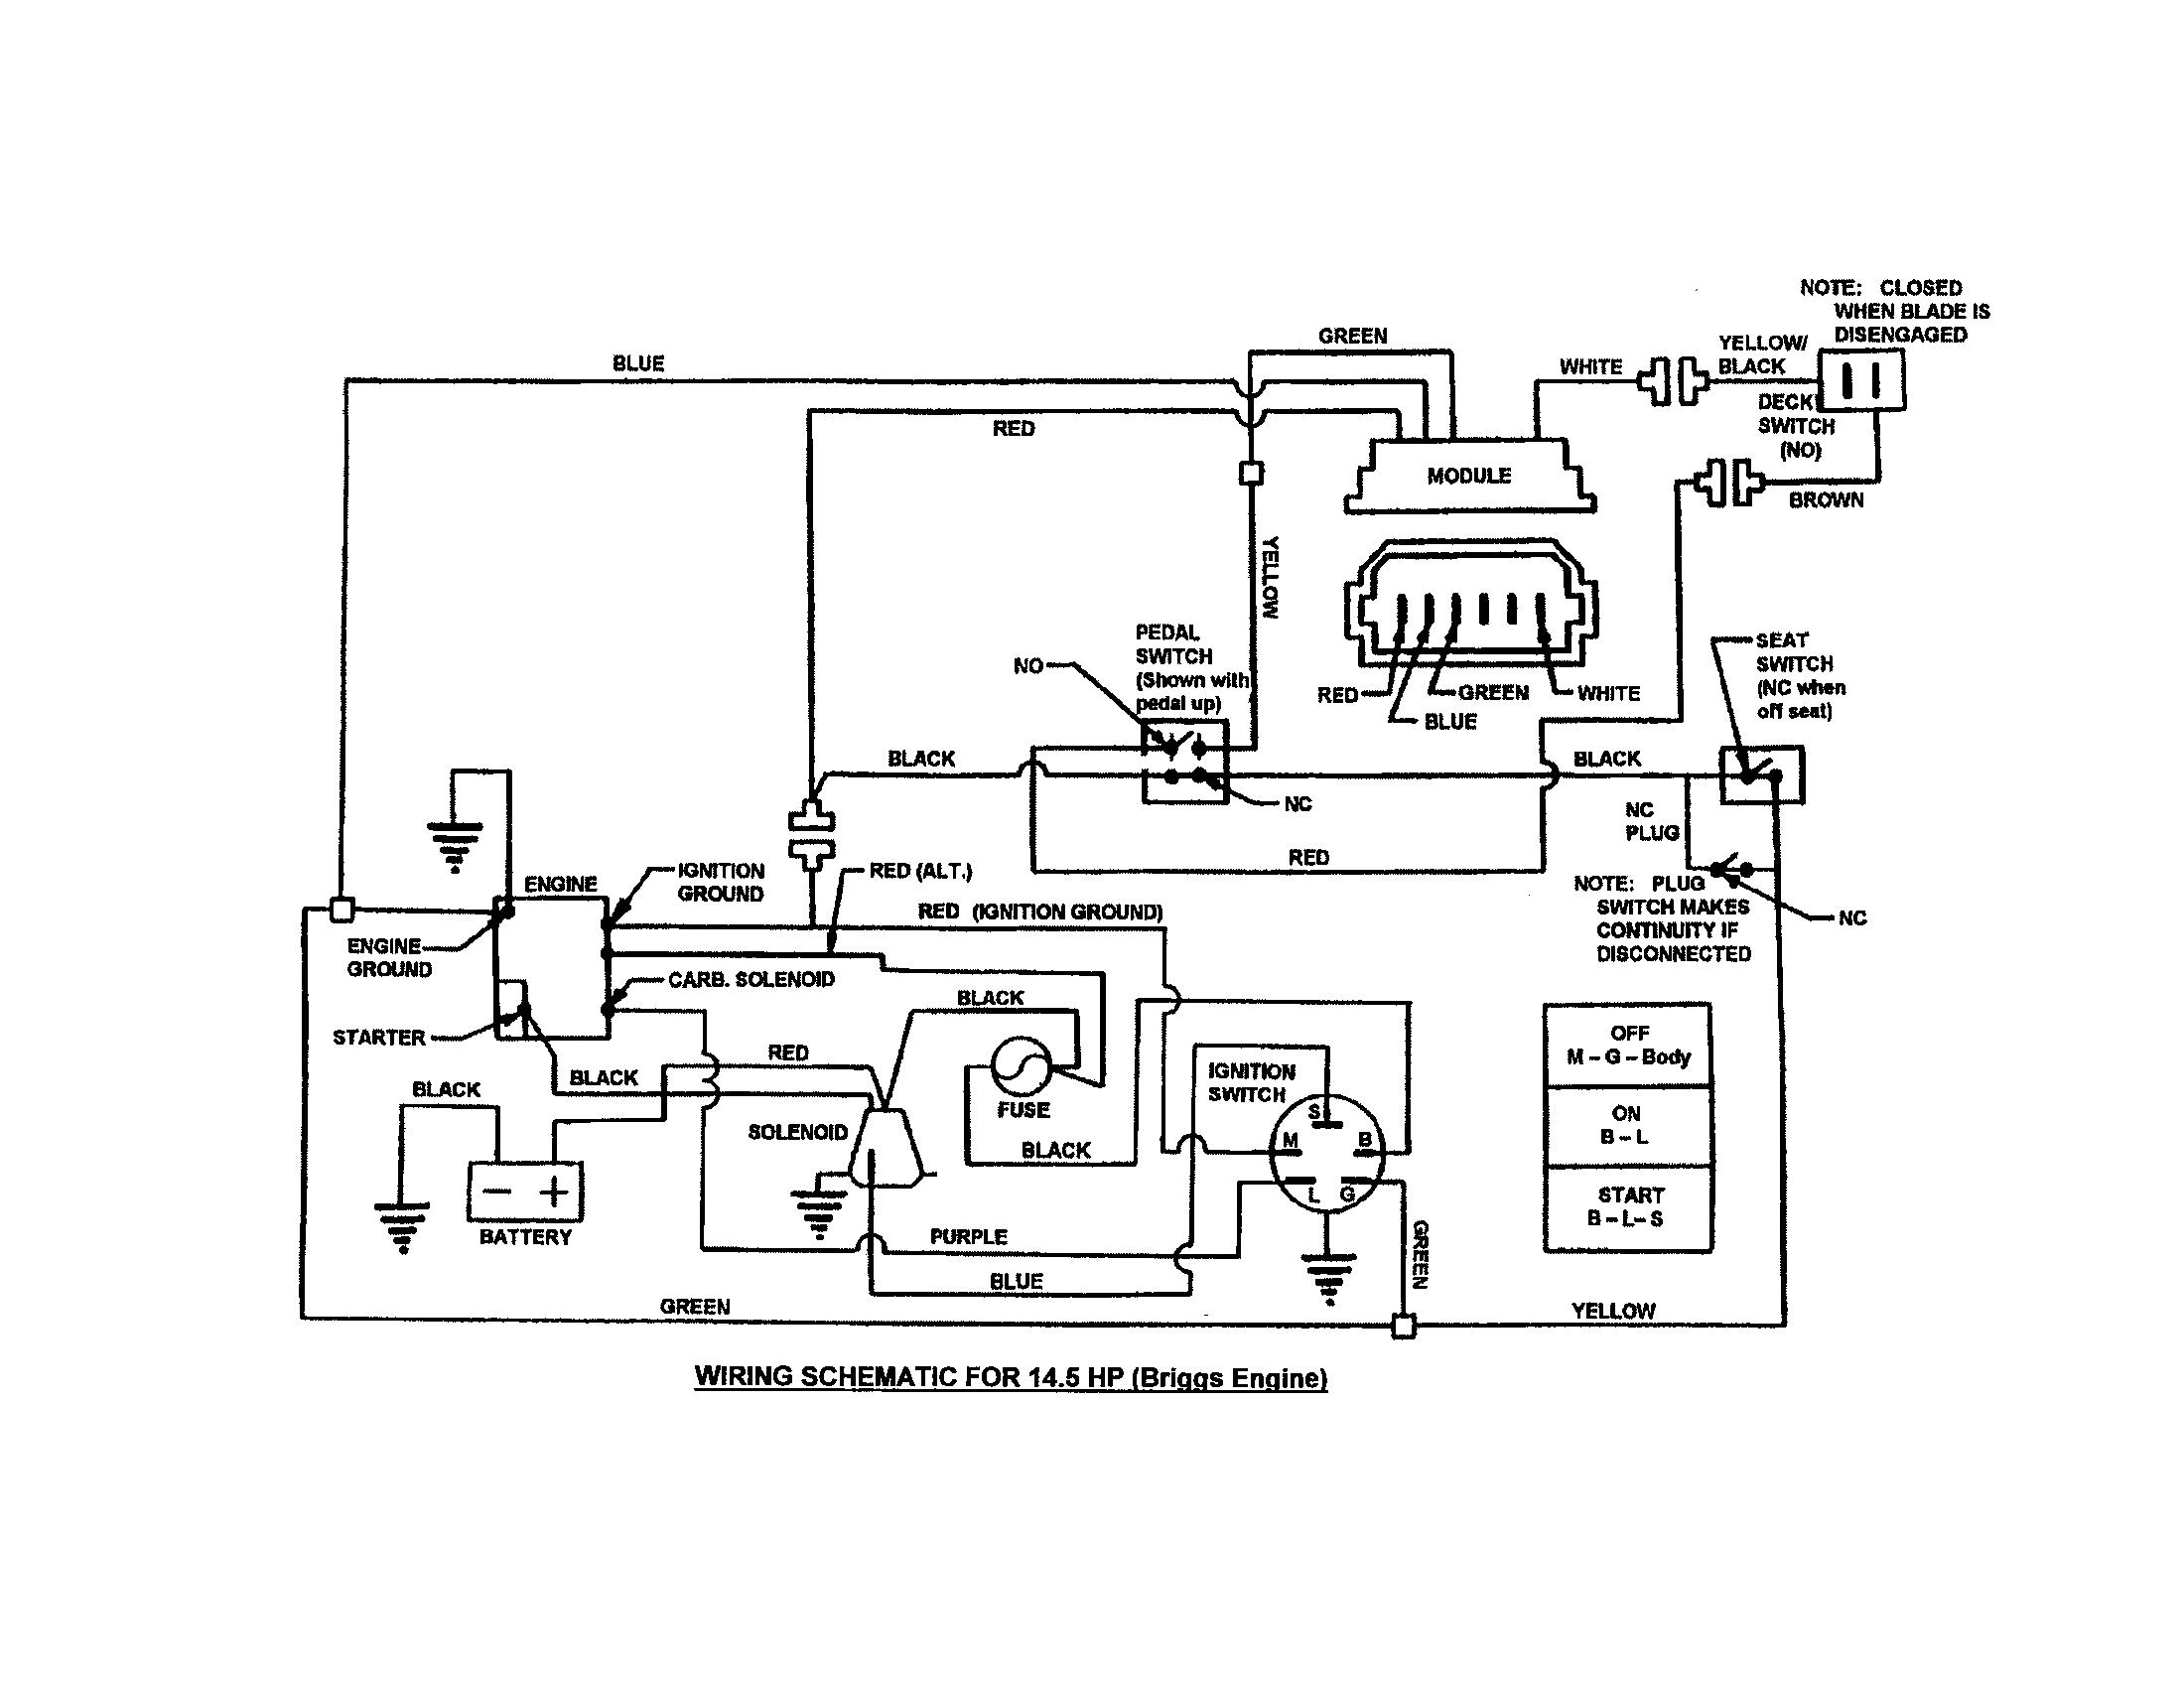 snapper riding mower wiring diagram wiring diagram today old snapper rear engine wiring diagram [ 2200 x 1696 Pixel ]